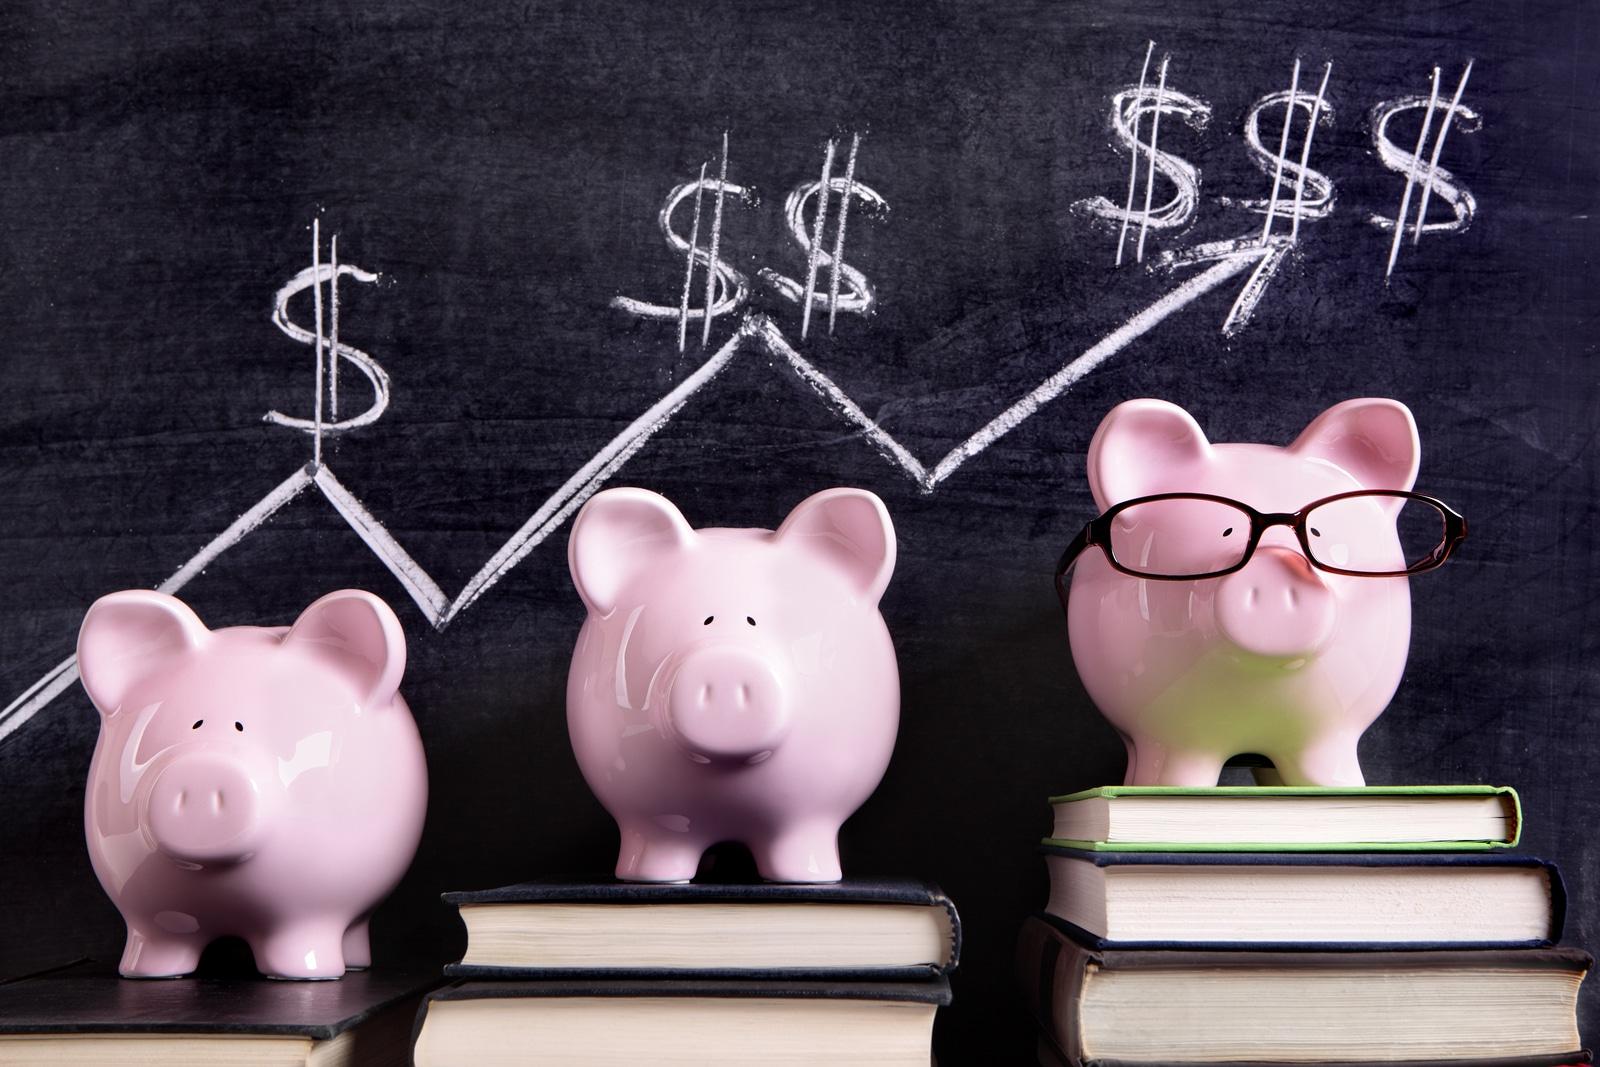 10 pasos para lograr un ahorro exitoso